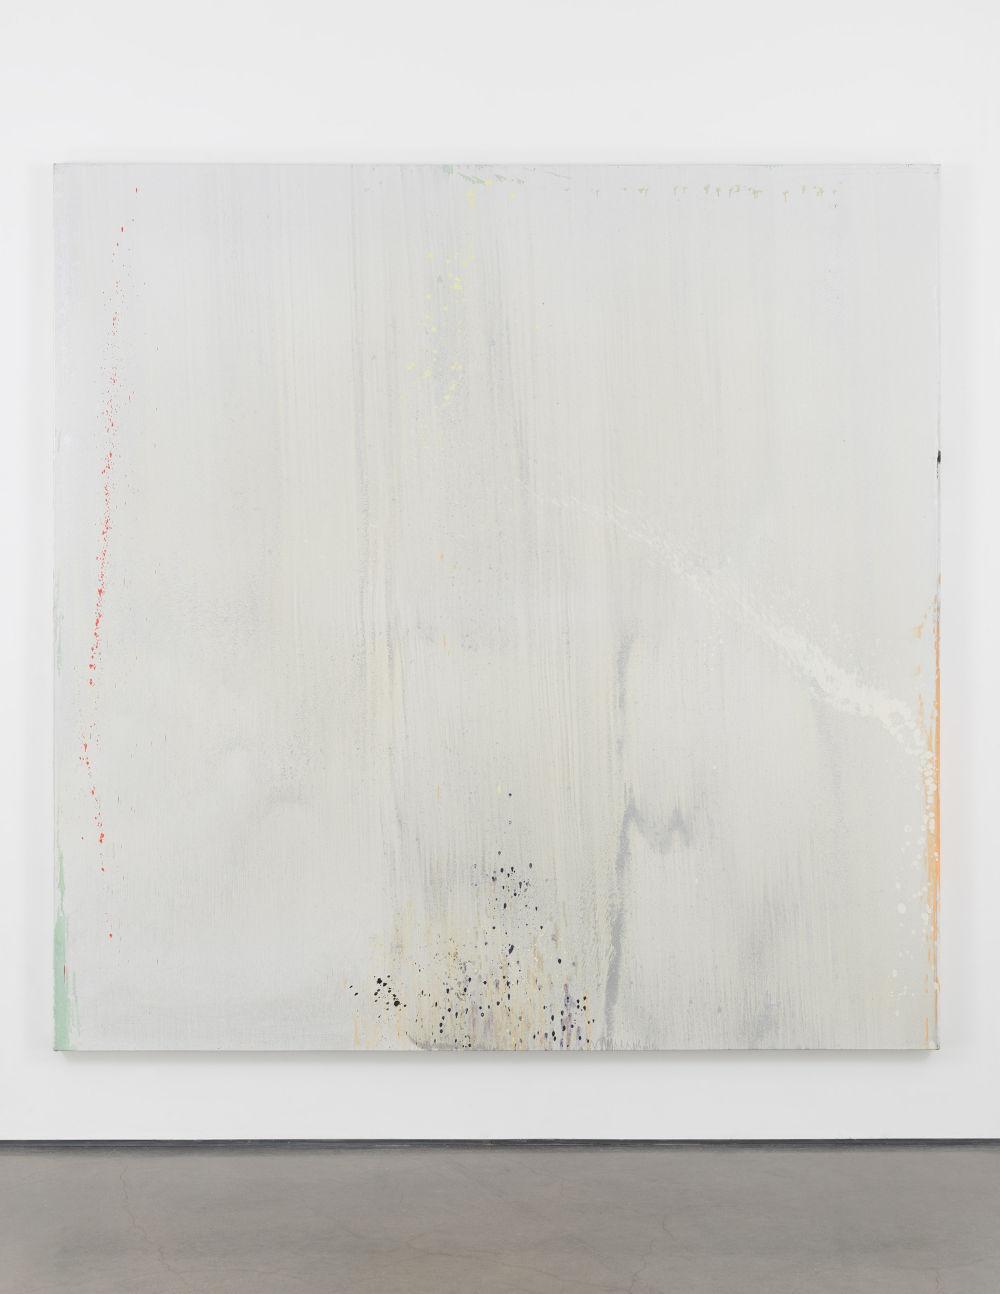 Pat Steir, Fog in the East II, 1998–99. Oil on canvas 108 x 108 inches (274.3 x 274.3 cm) © 2019 Pat Steir. Photo: Elisabeth Bernstein